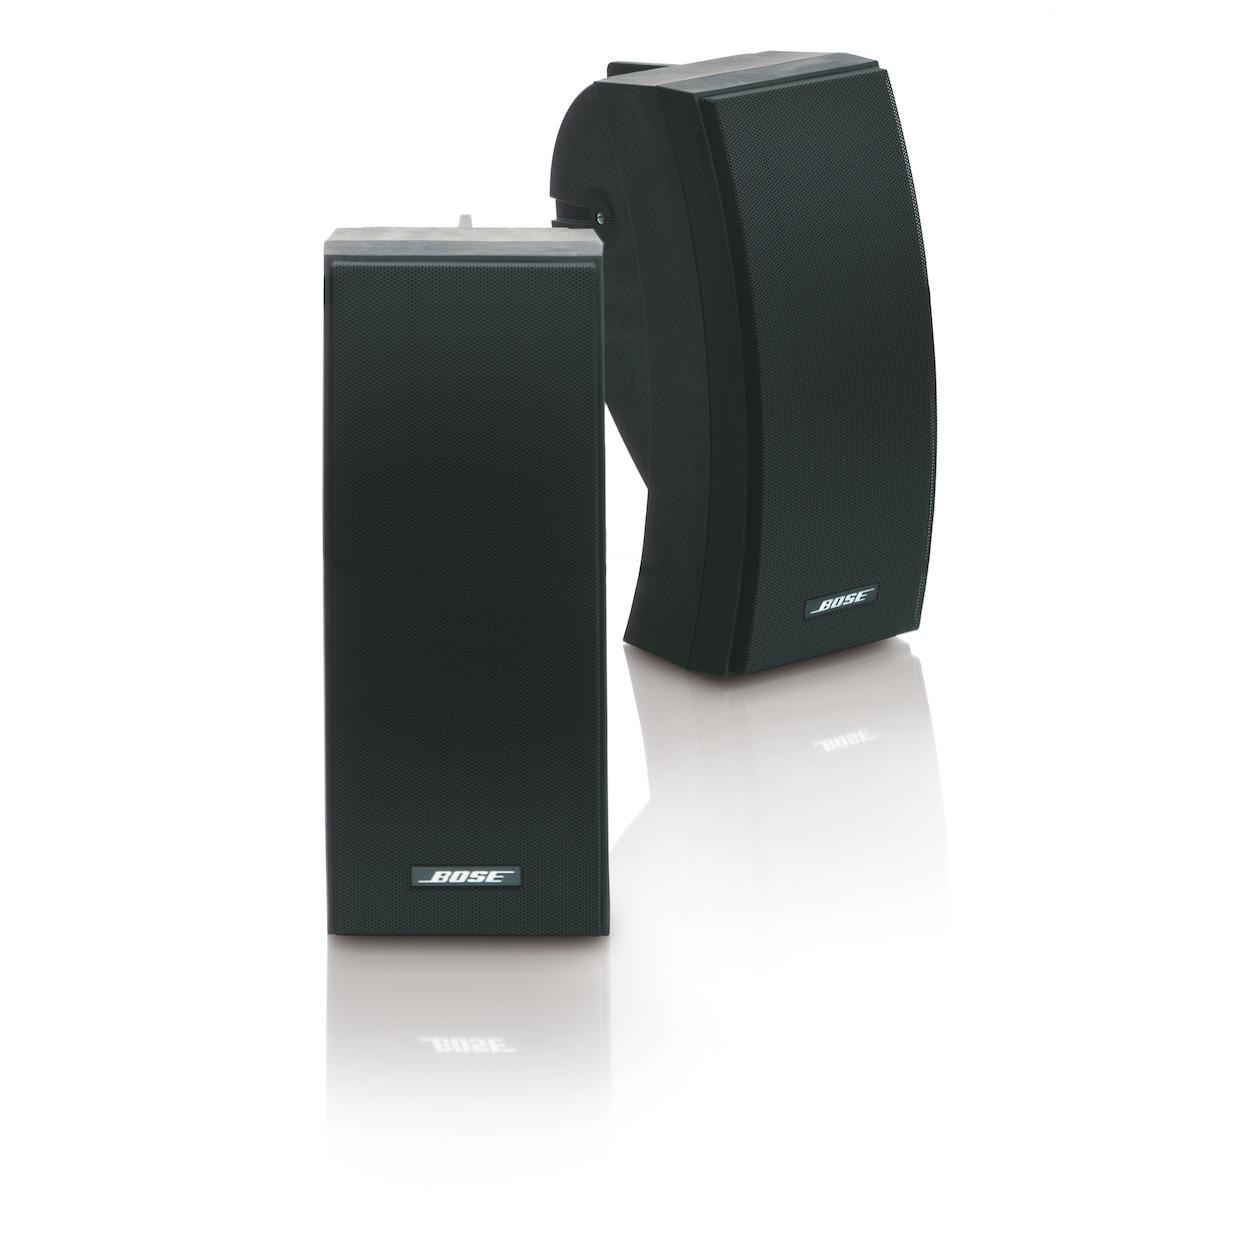 Bose boekenplank speaker 251 Environmental speaker - (including brackets) zwart